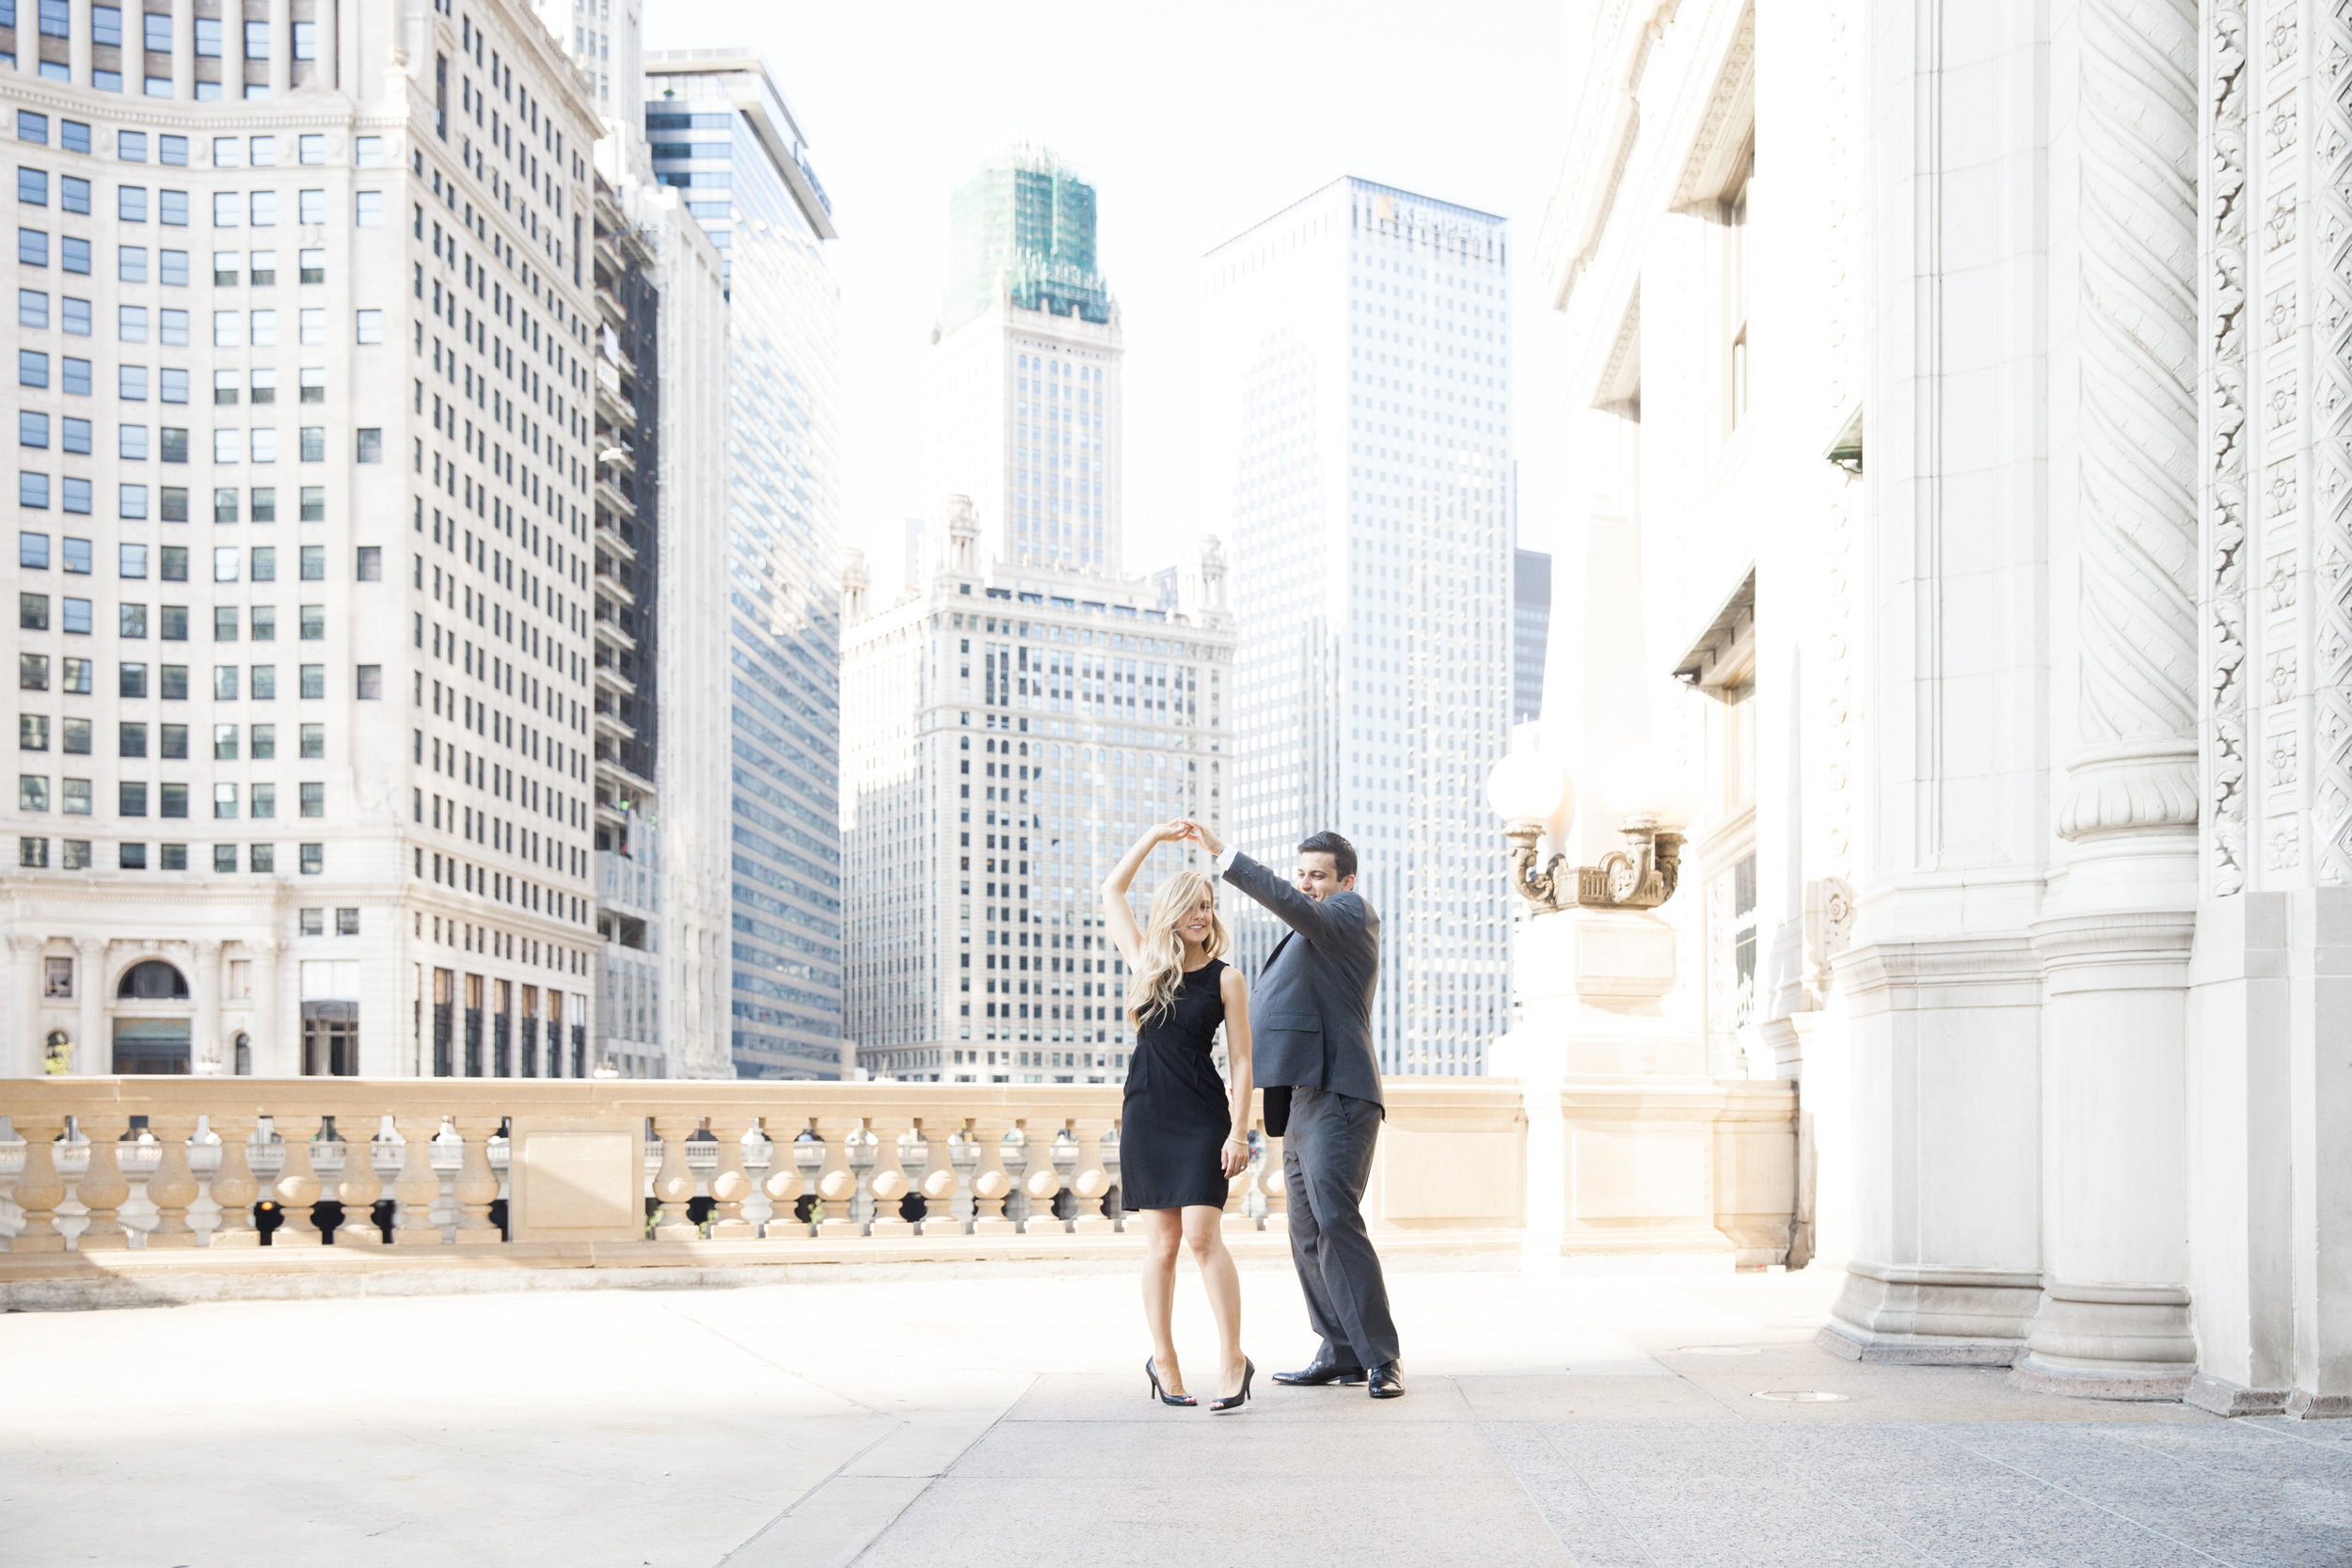 LisaDiederichPhotography_Landon&Ramsey_ChicagoEngagement-30.jpg